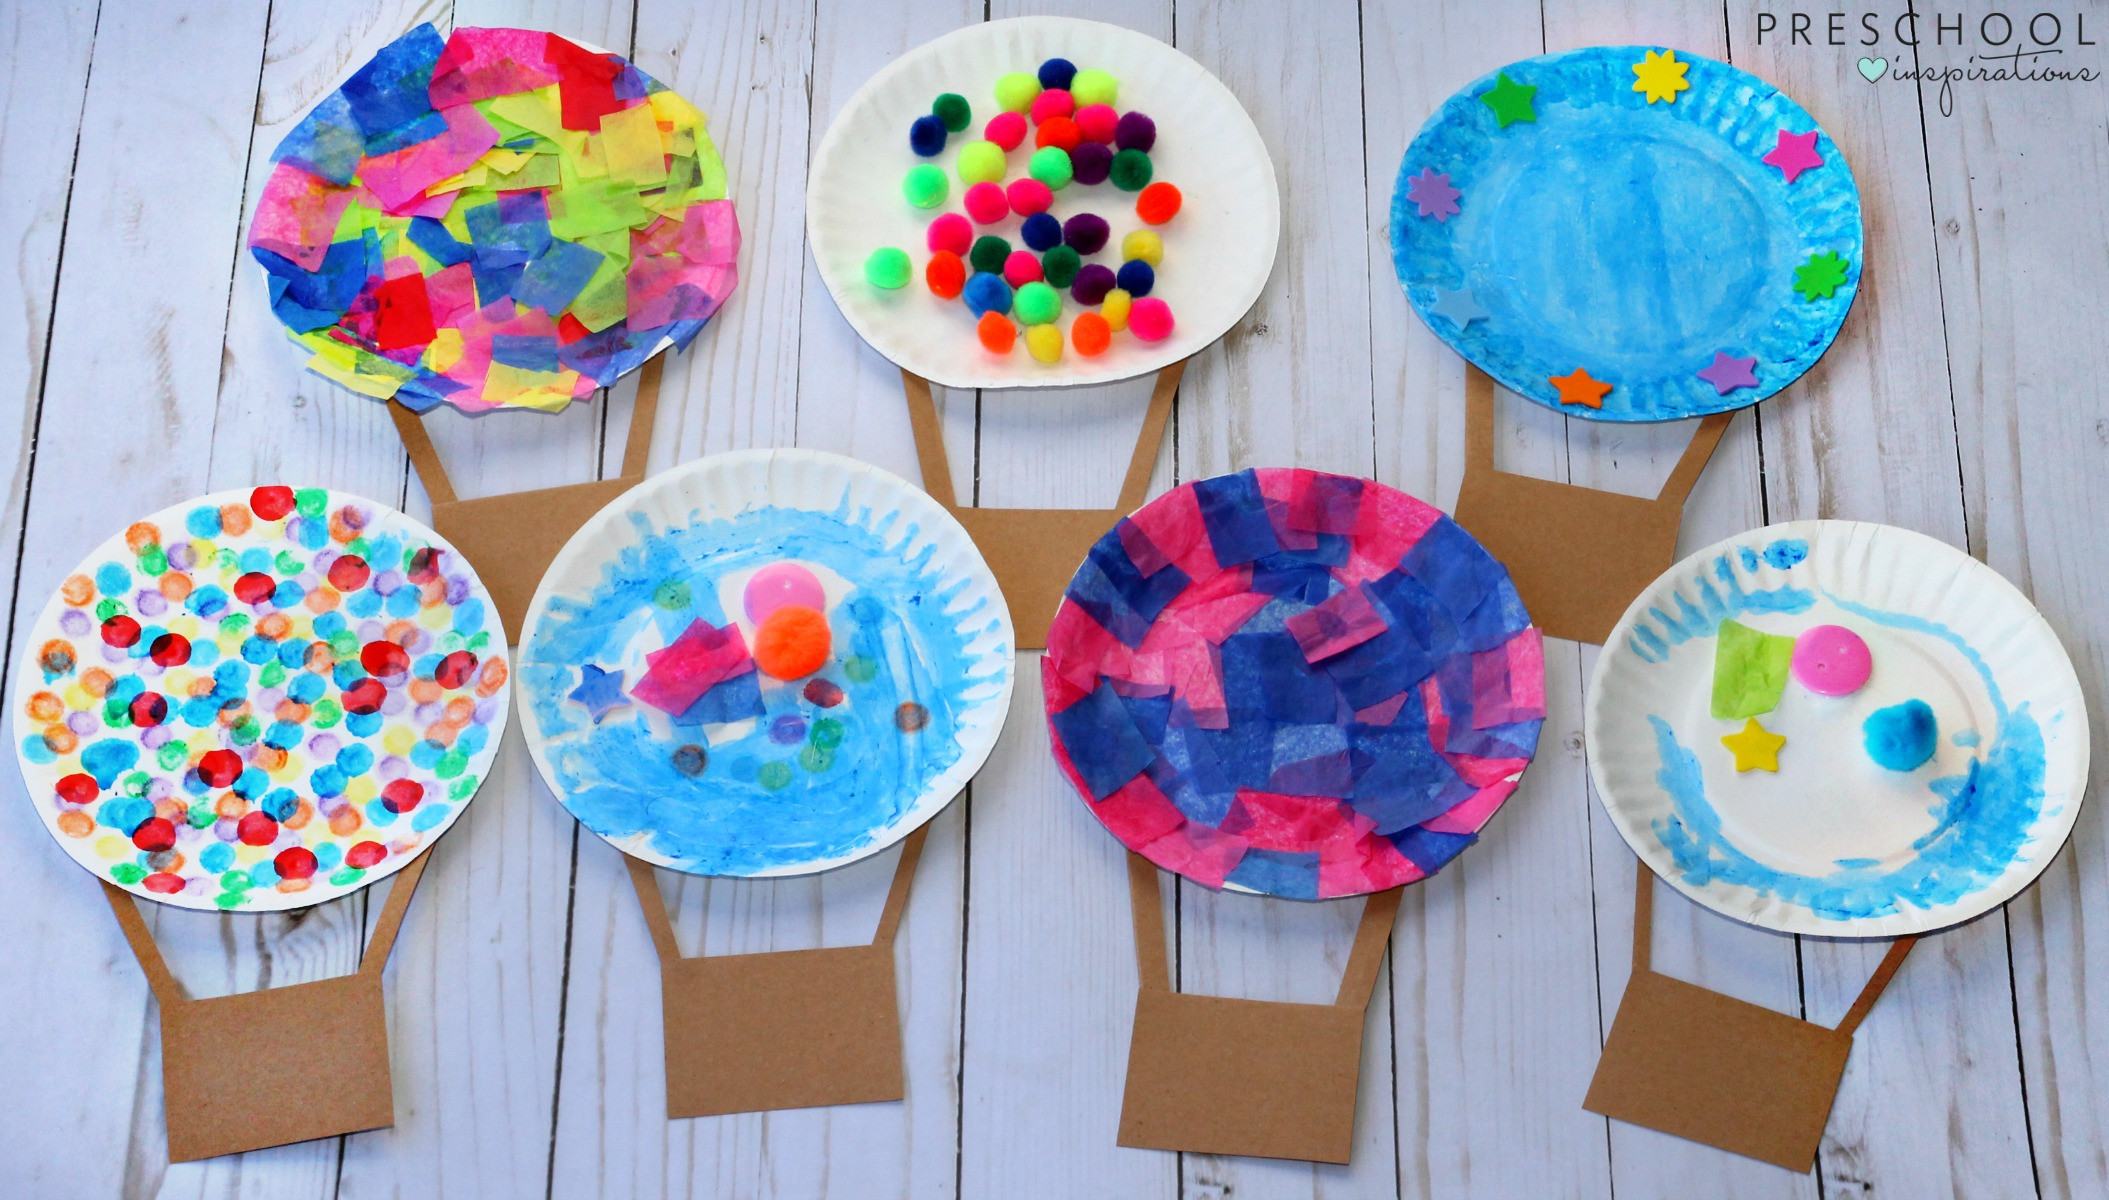 Preschool Craft Activities  Hot Air Balloon Art Activity Preschool Inspirations